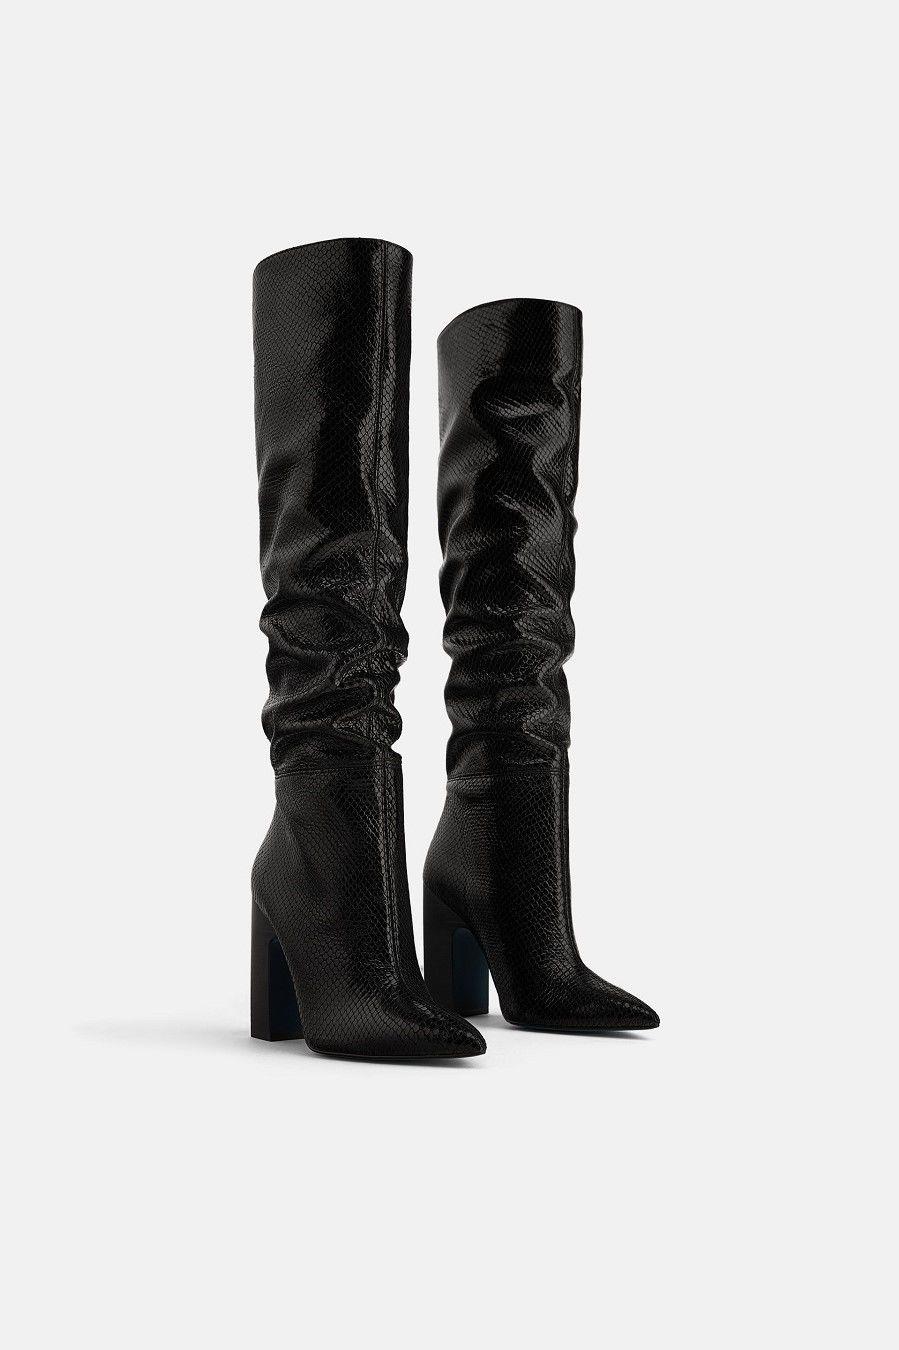 7 Model Boots yang Bikin OOTD Paling Cetar di Pesta Malam Tahun Baru